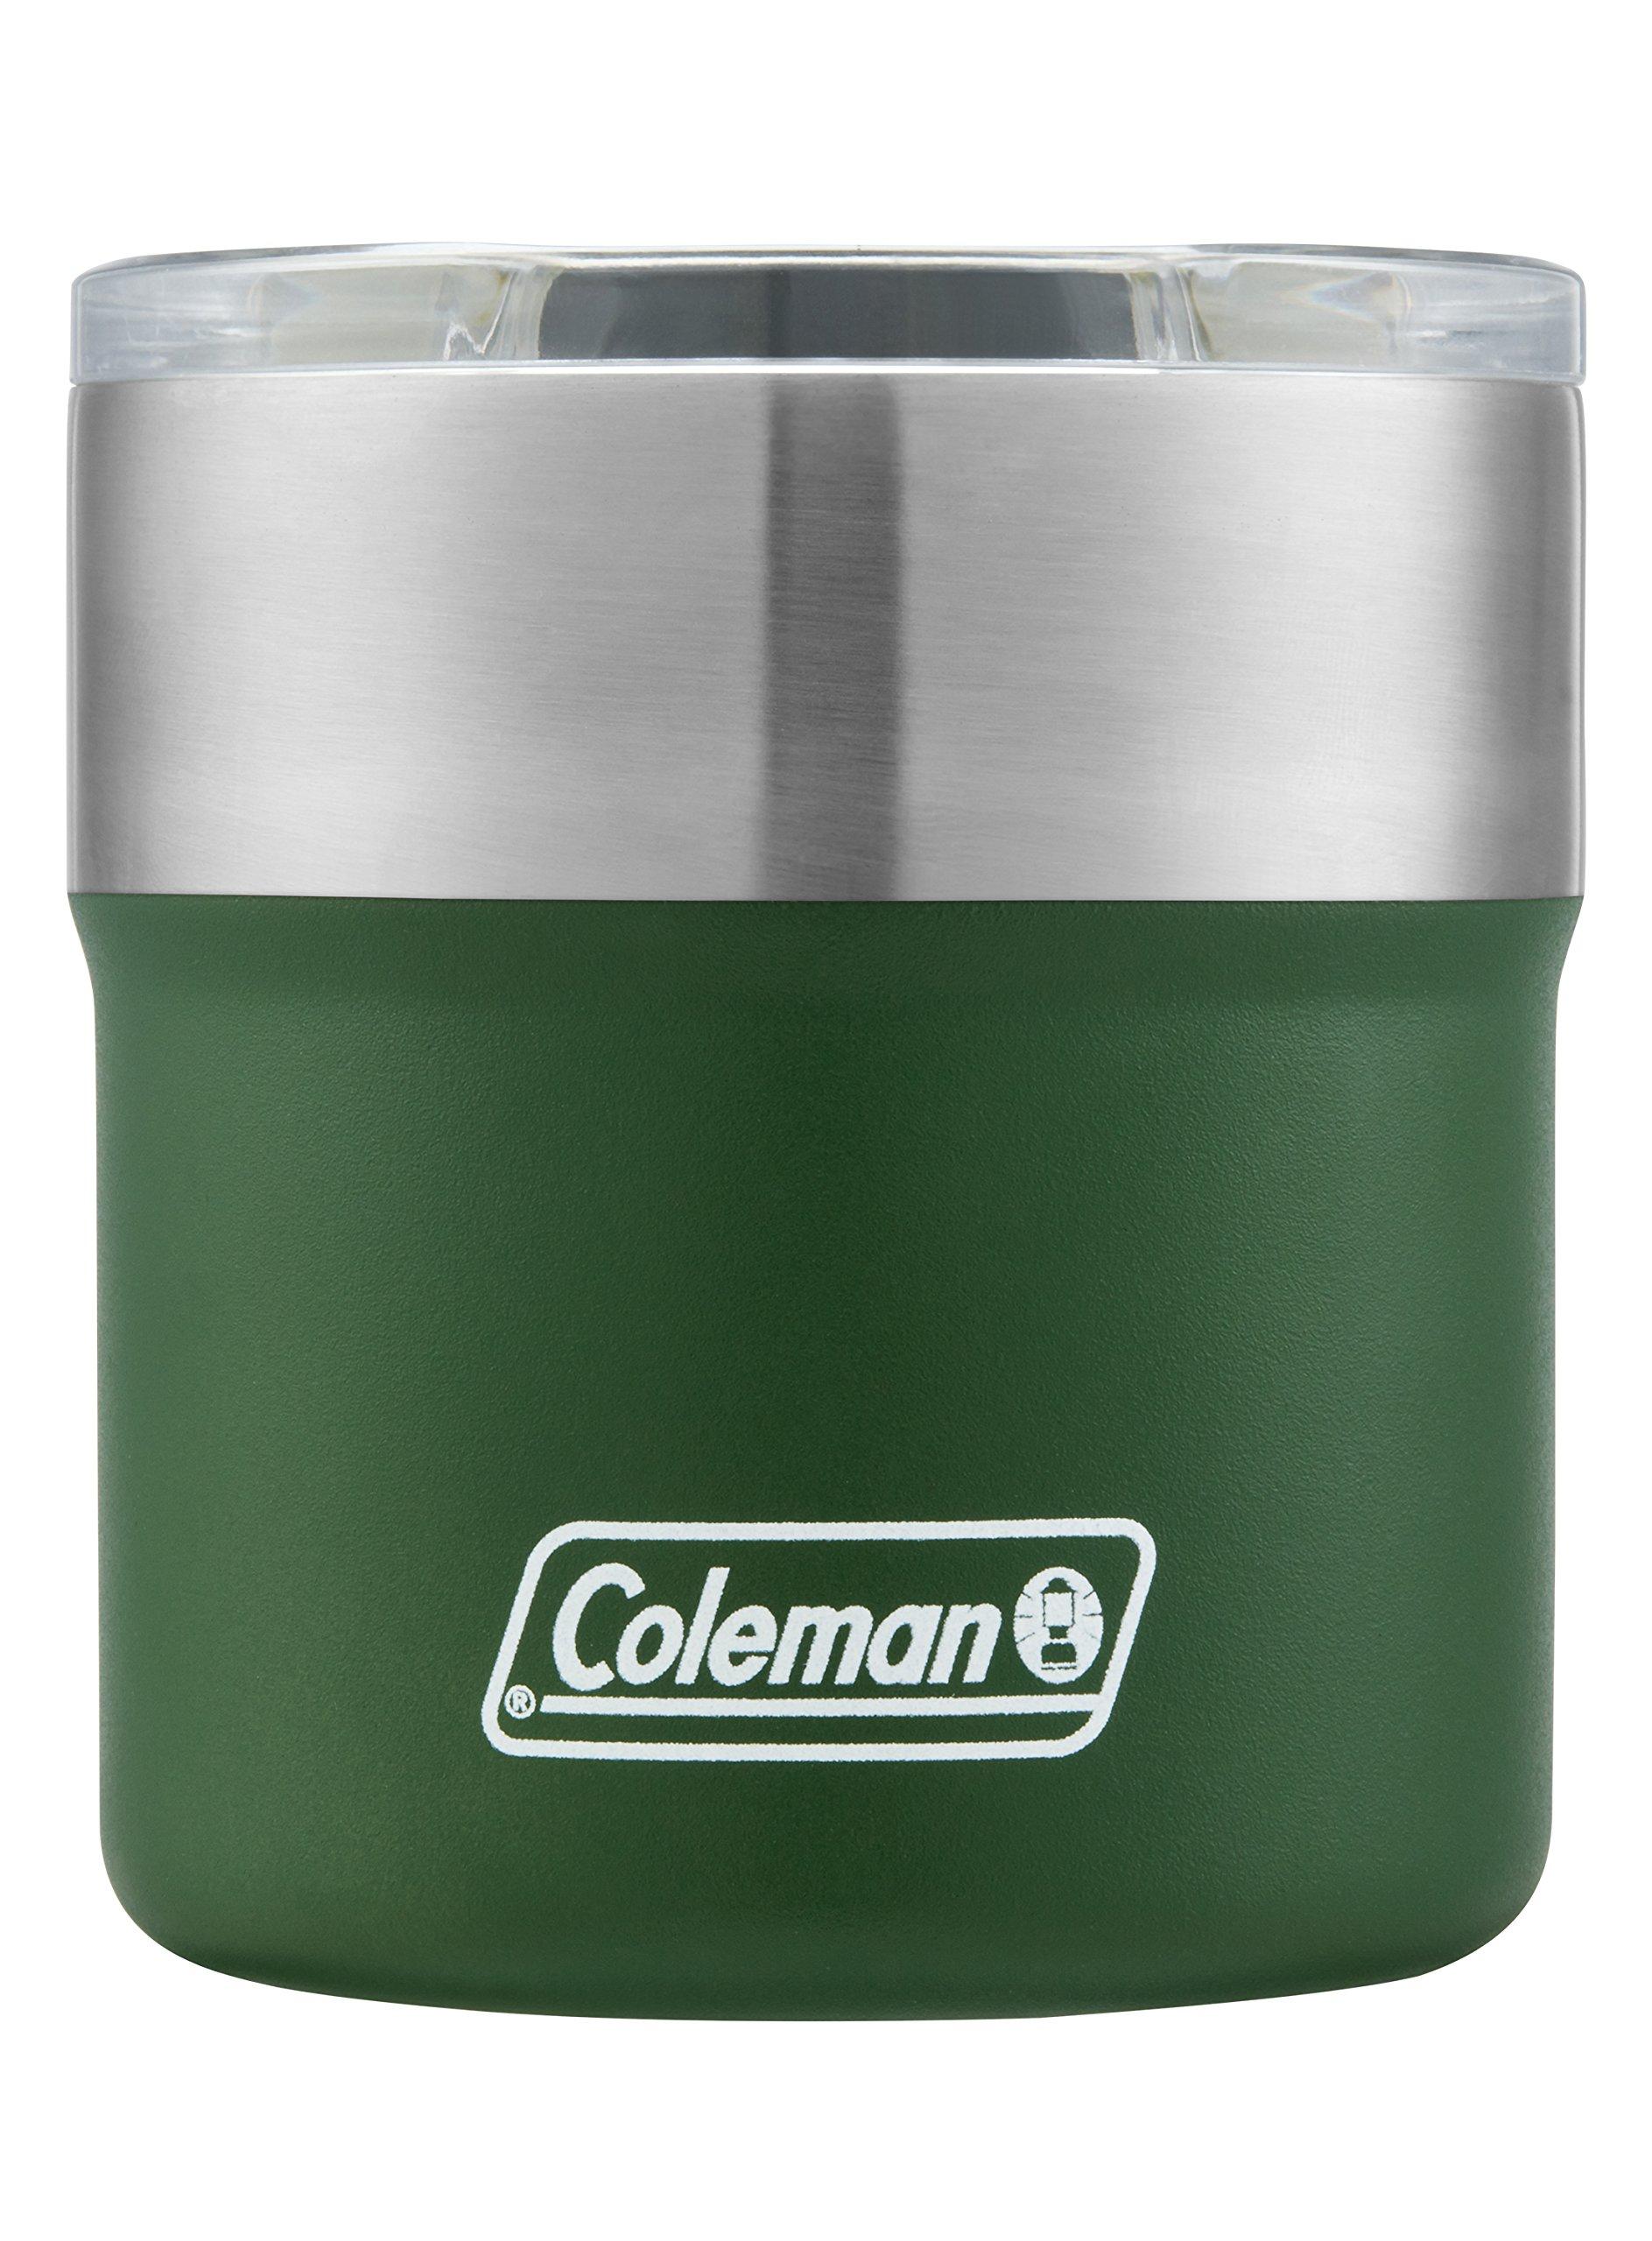 Coleman Sundowner Insulated Stainless Steel Rocks Glass, Heritage Green, 13 oz.